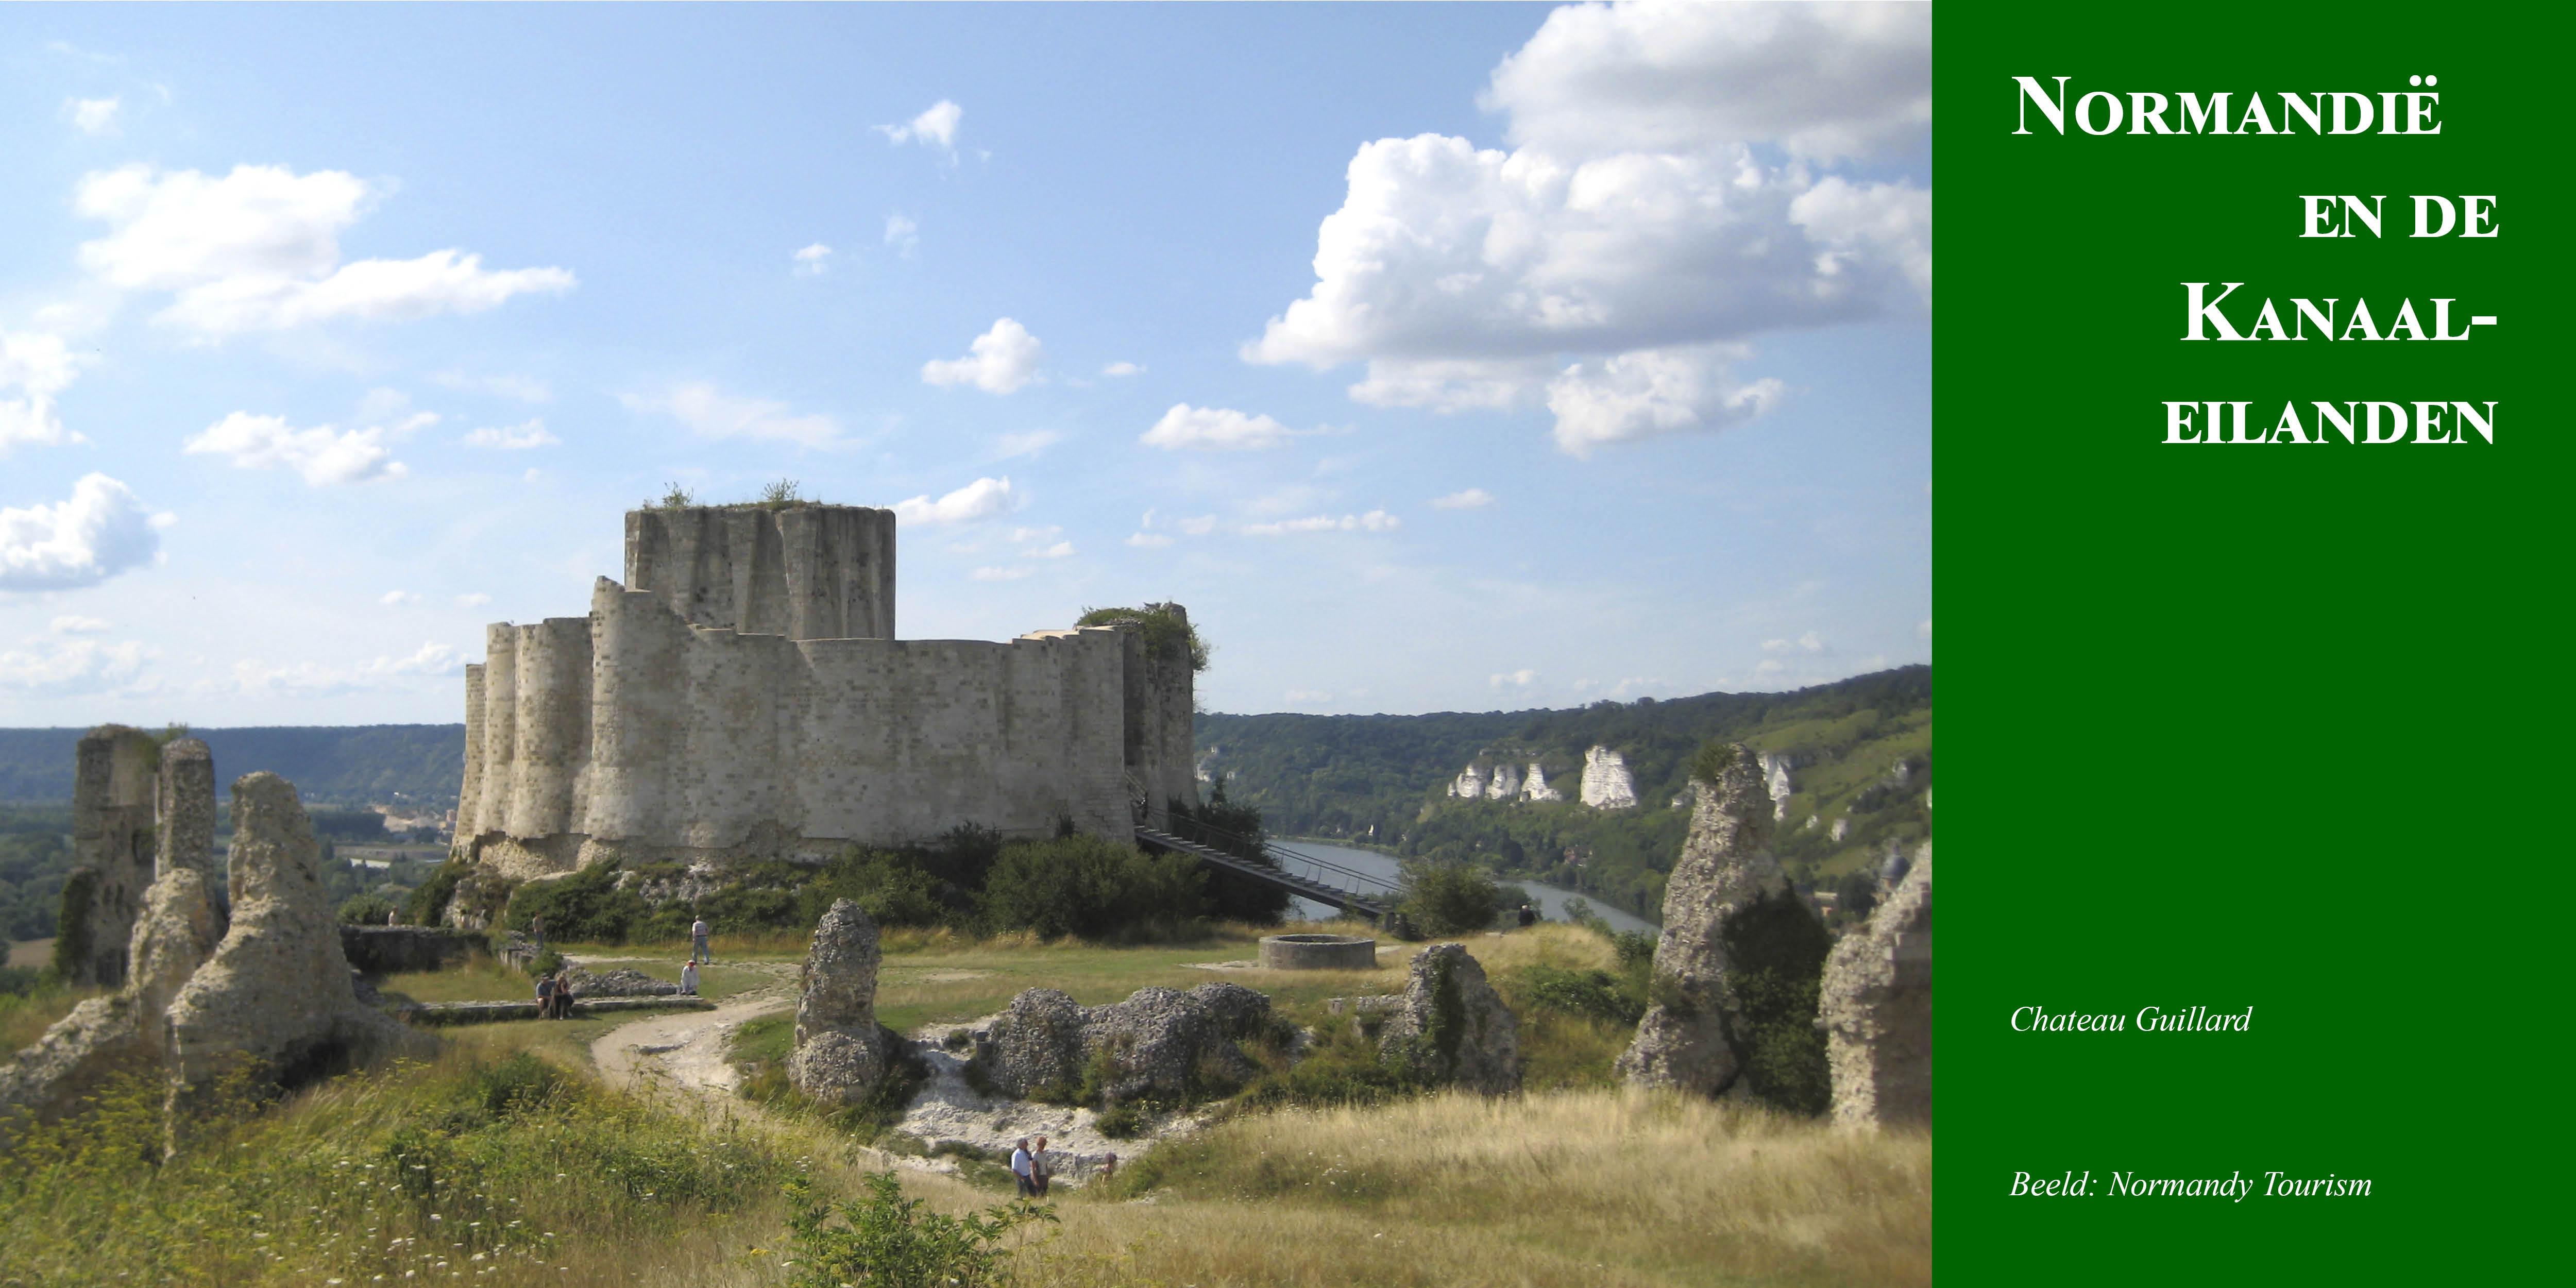 Chateau Guillard